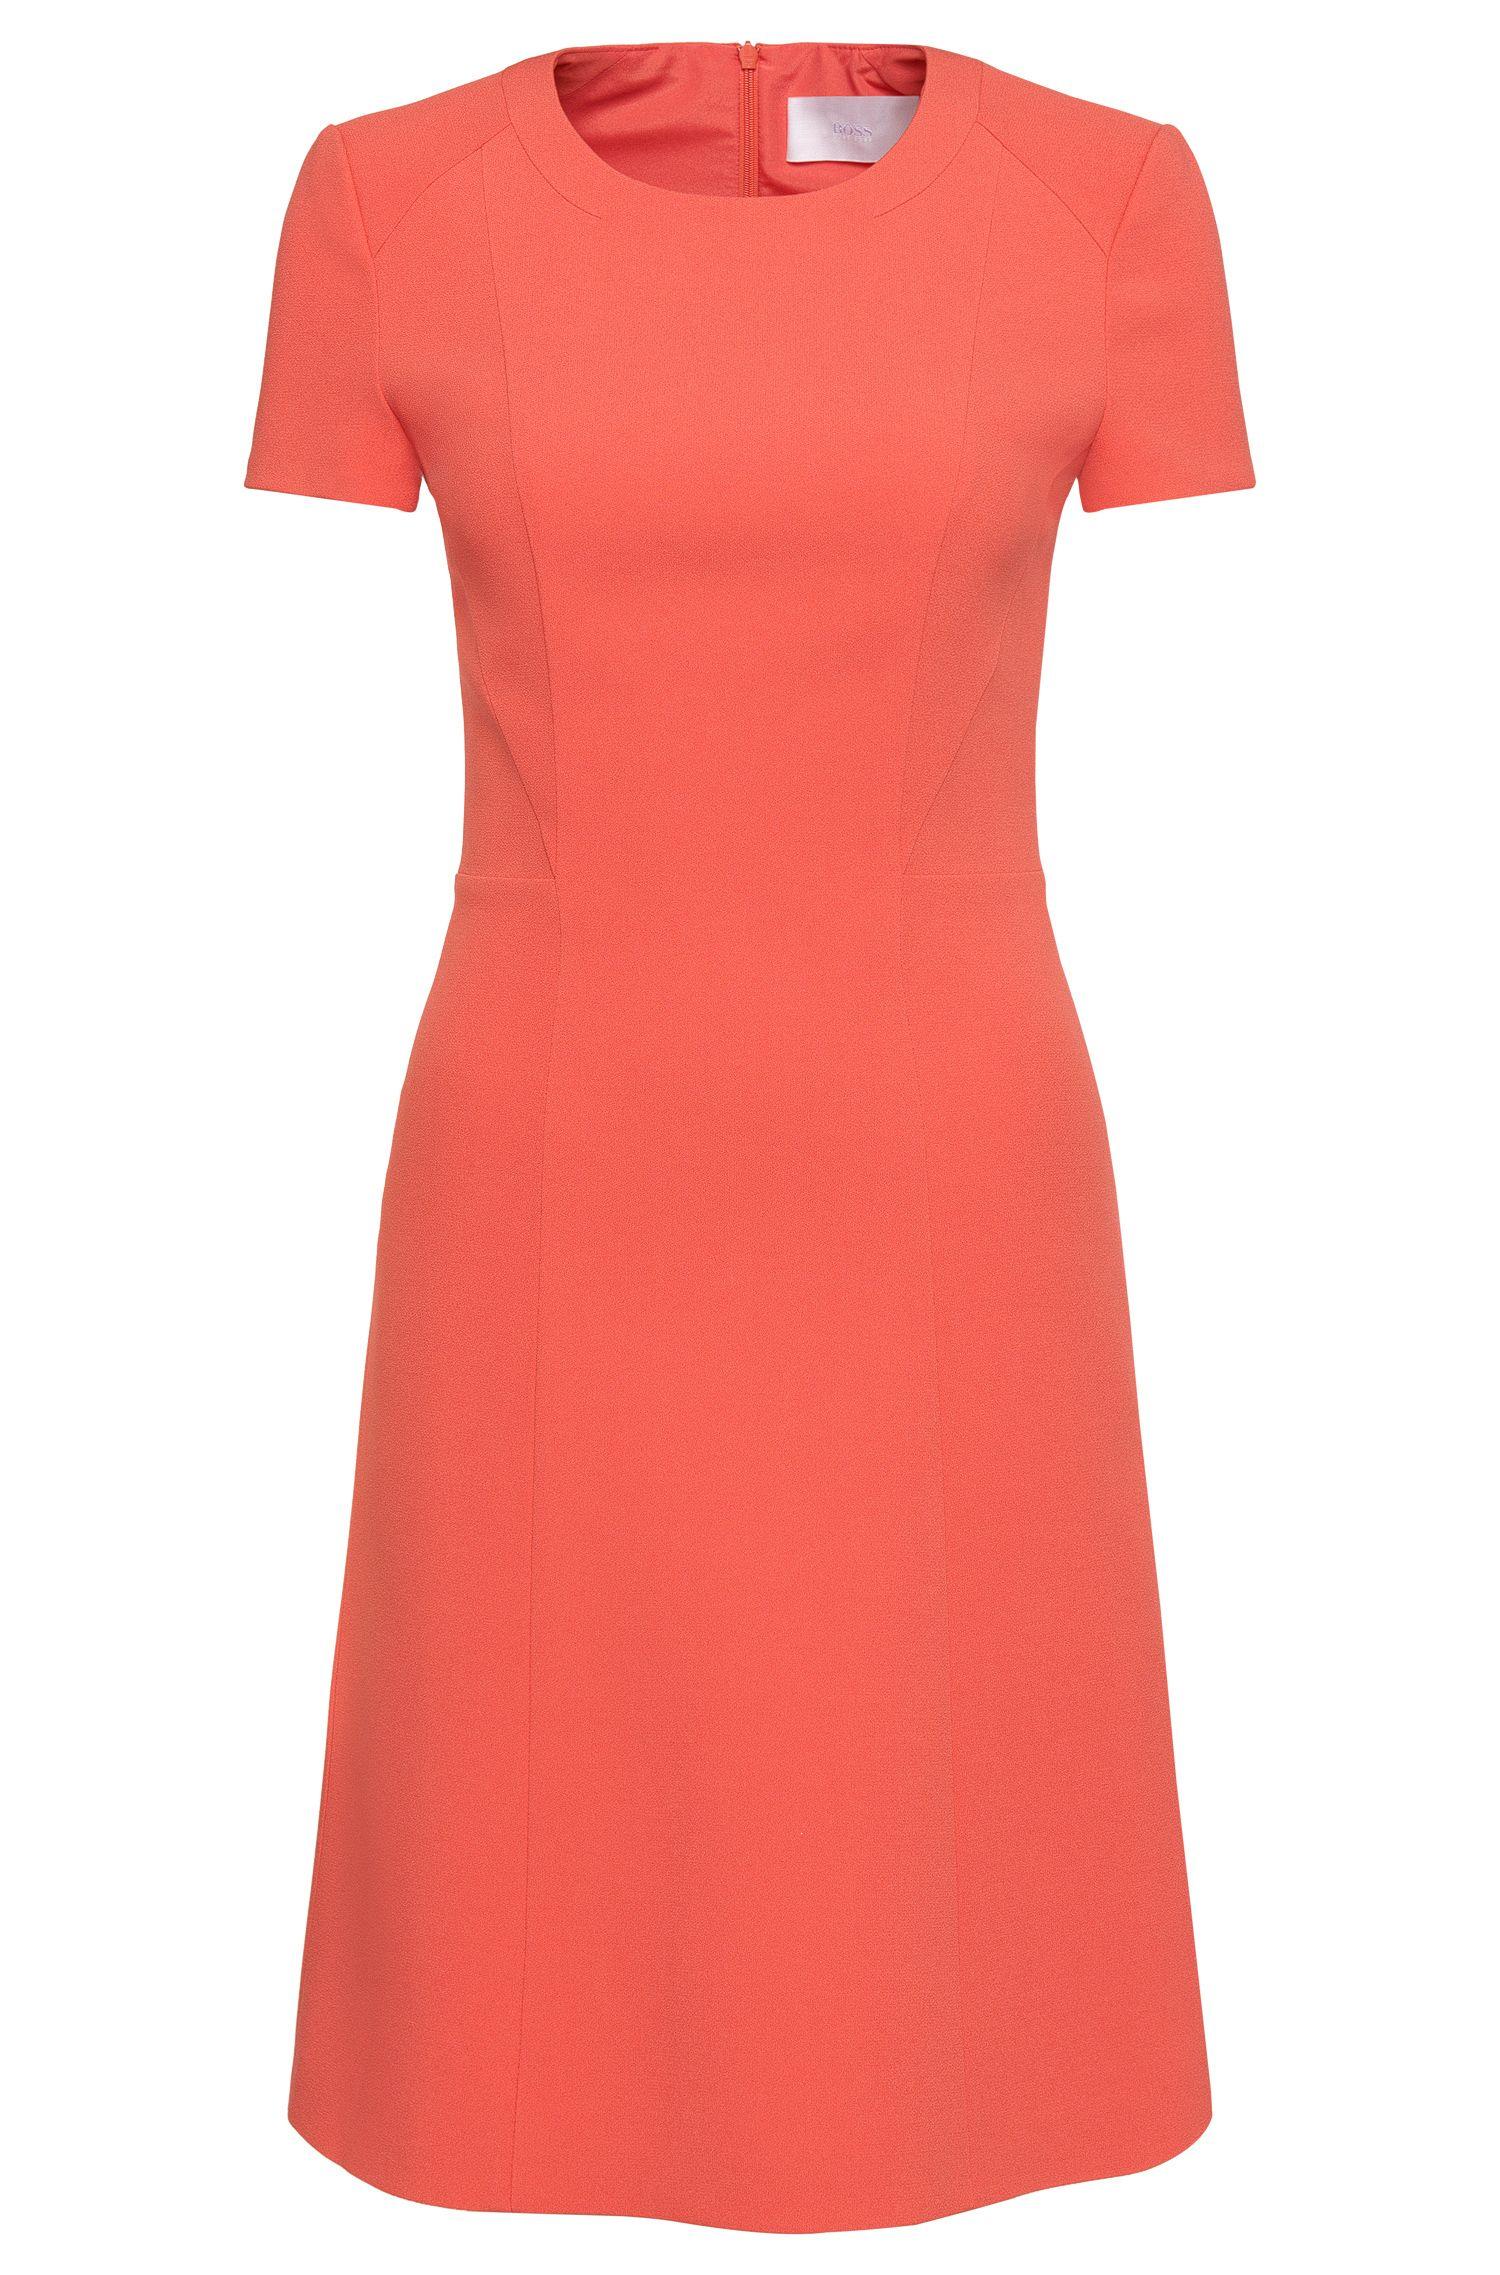 Unifarbenes, tailliertes Kurzarm-Kleid: 'Dipela'